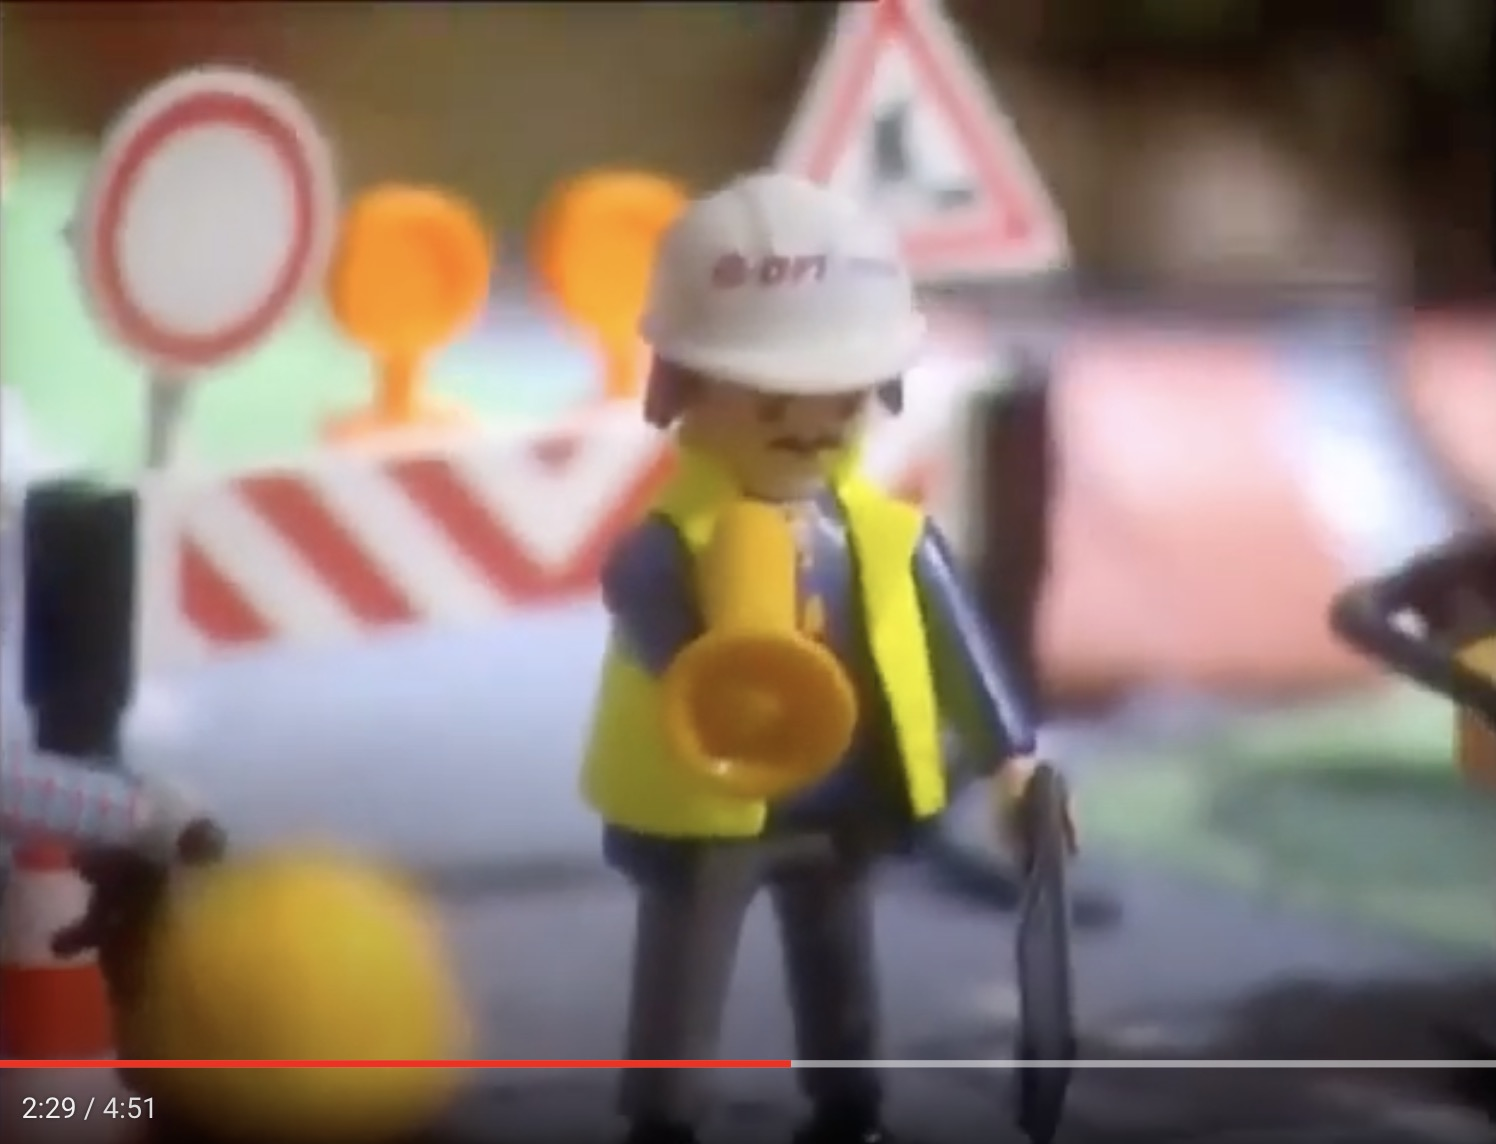 E.ON Spielfigur in Baustellenlandschaft